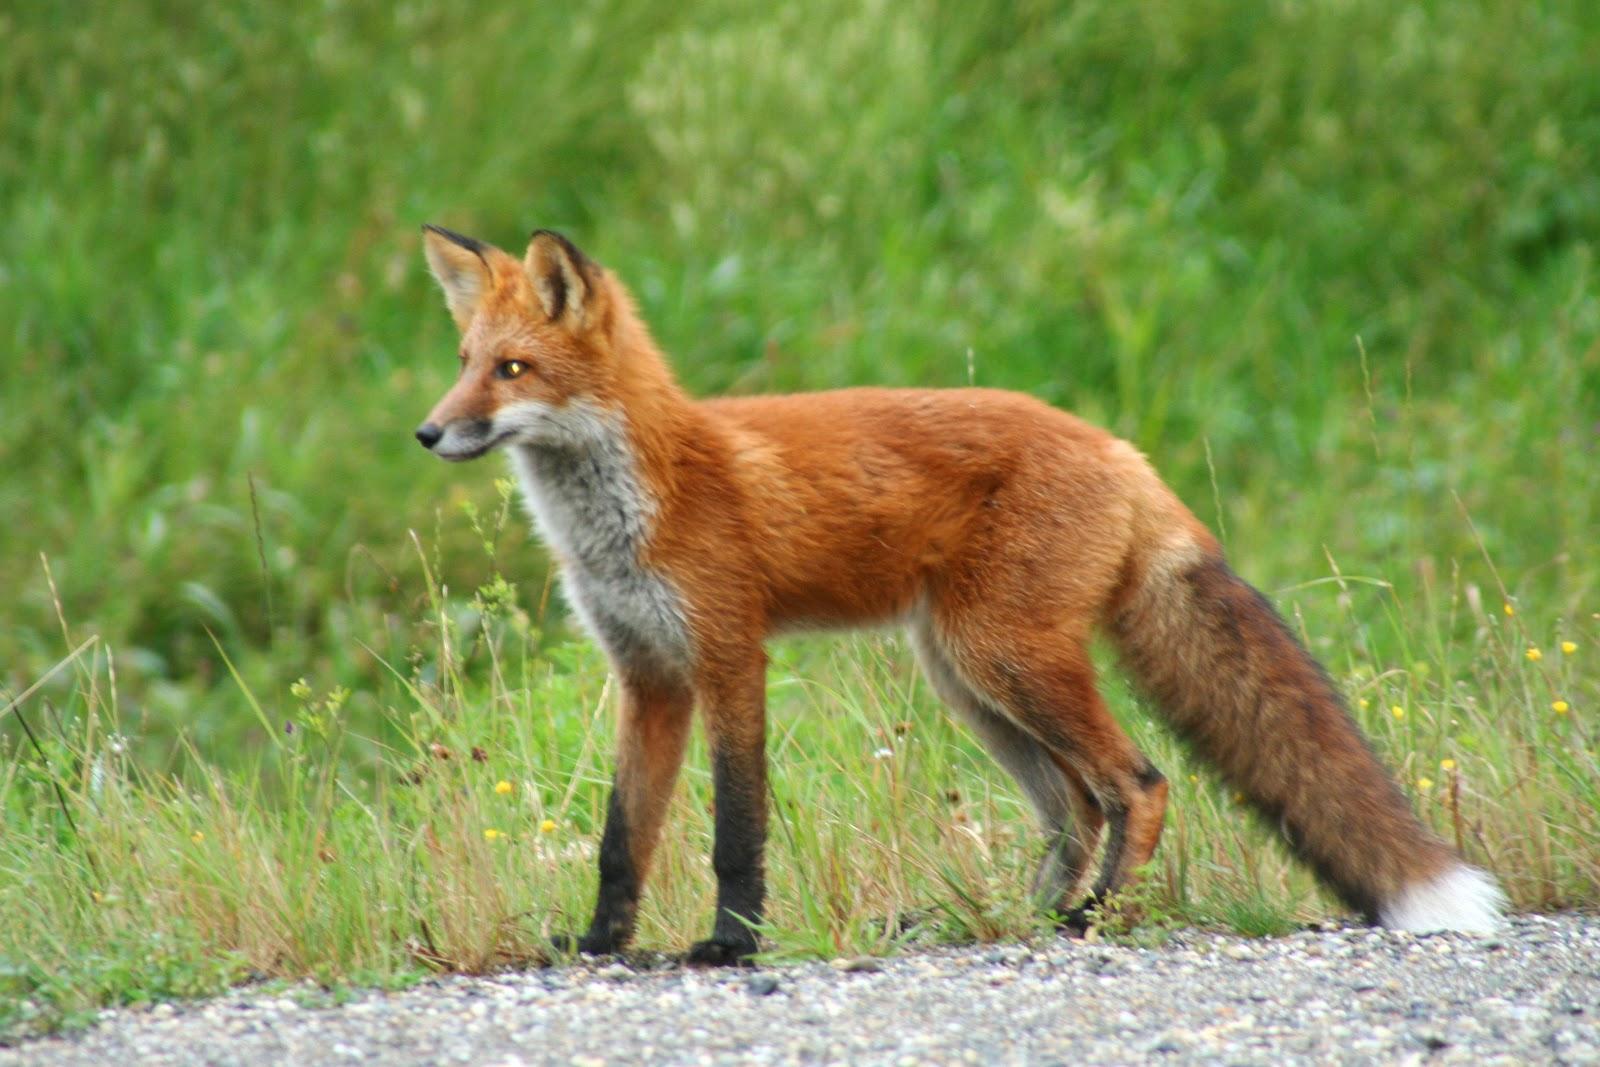 fox pens phase out virginia public radio. Black Bedroom Furniture Sets. Home Design Ideas